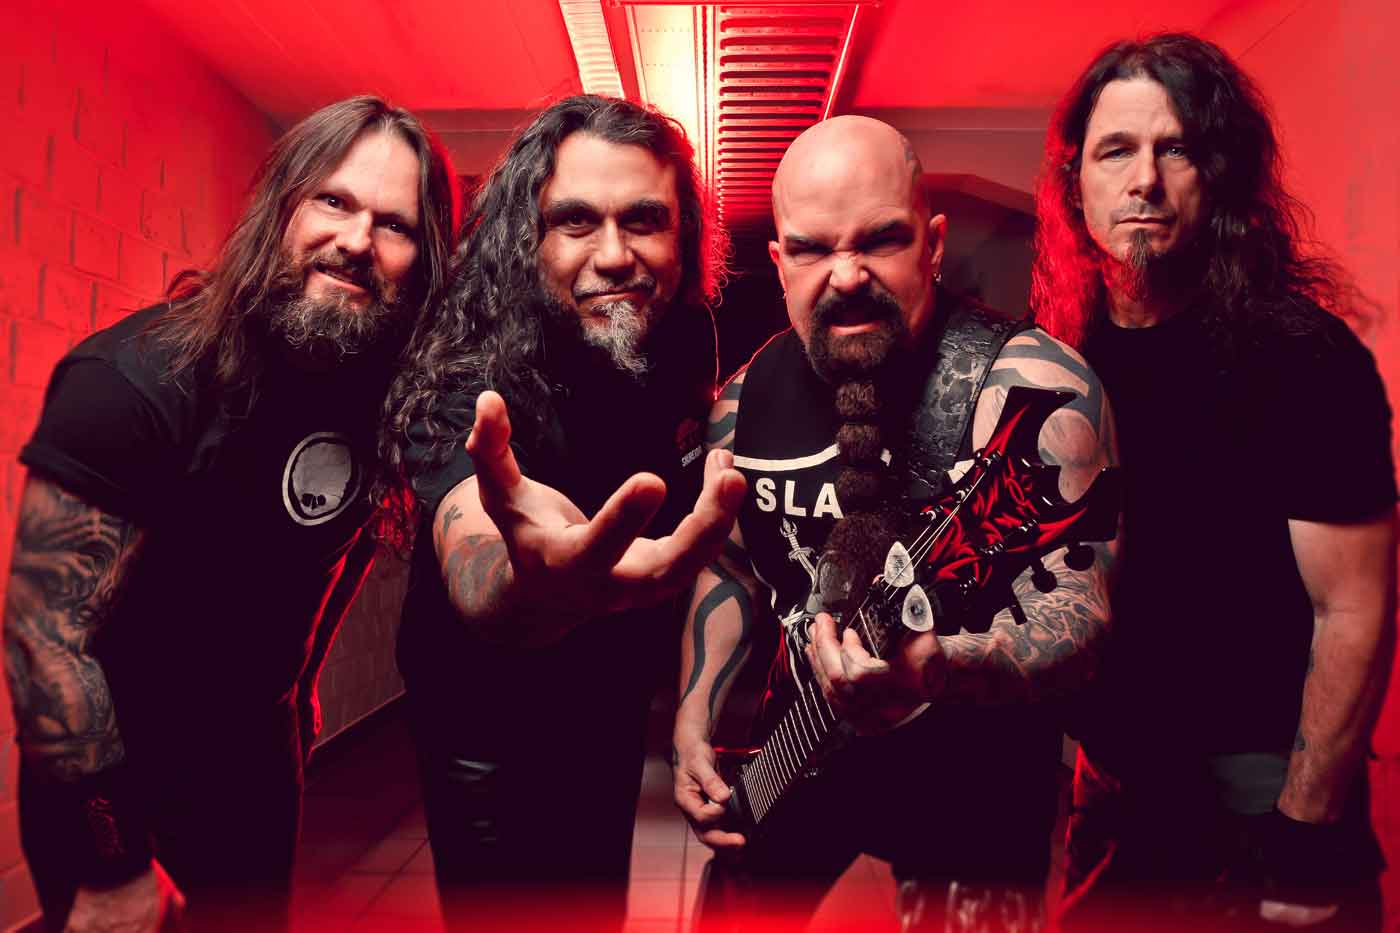 Slayer se despiden acompañados por Lamb of God, Anthrax y Obituary